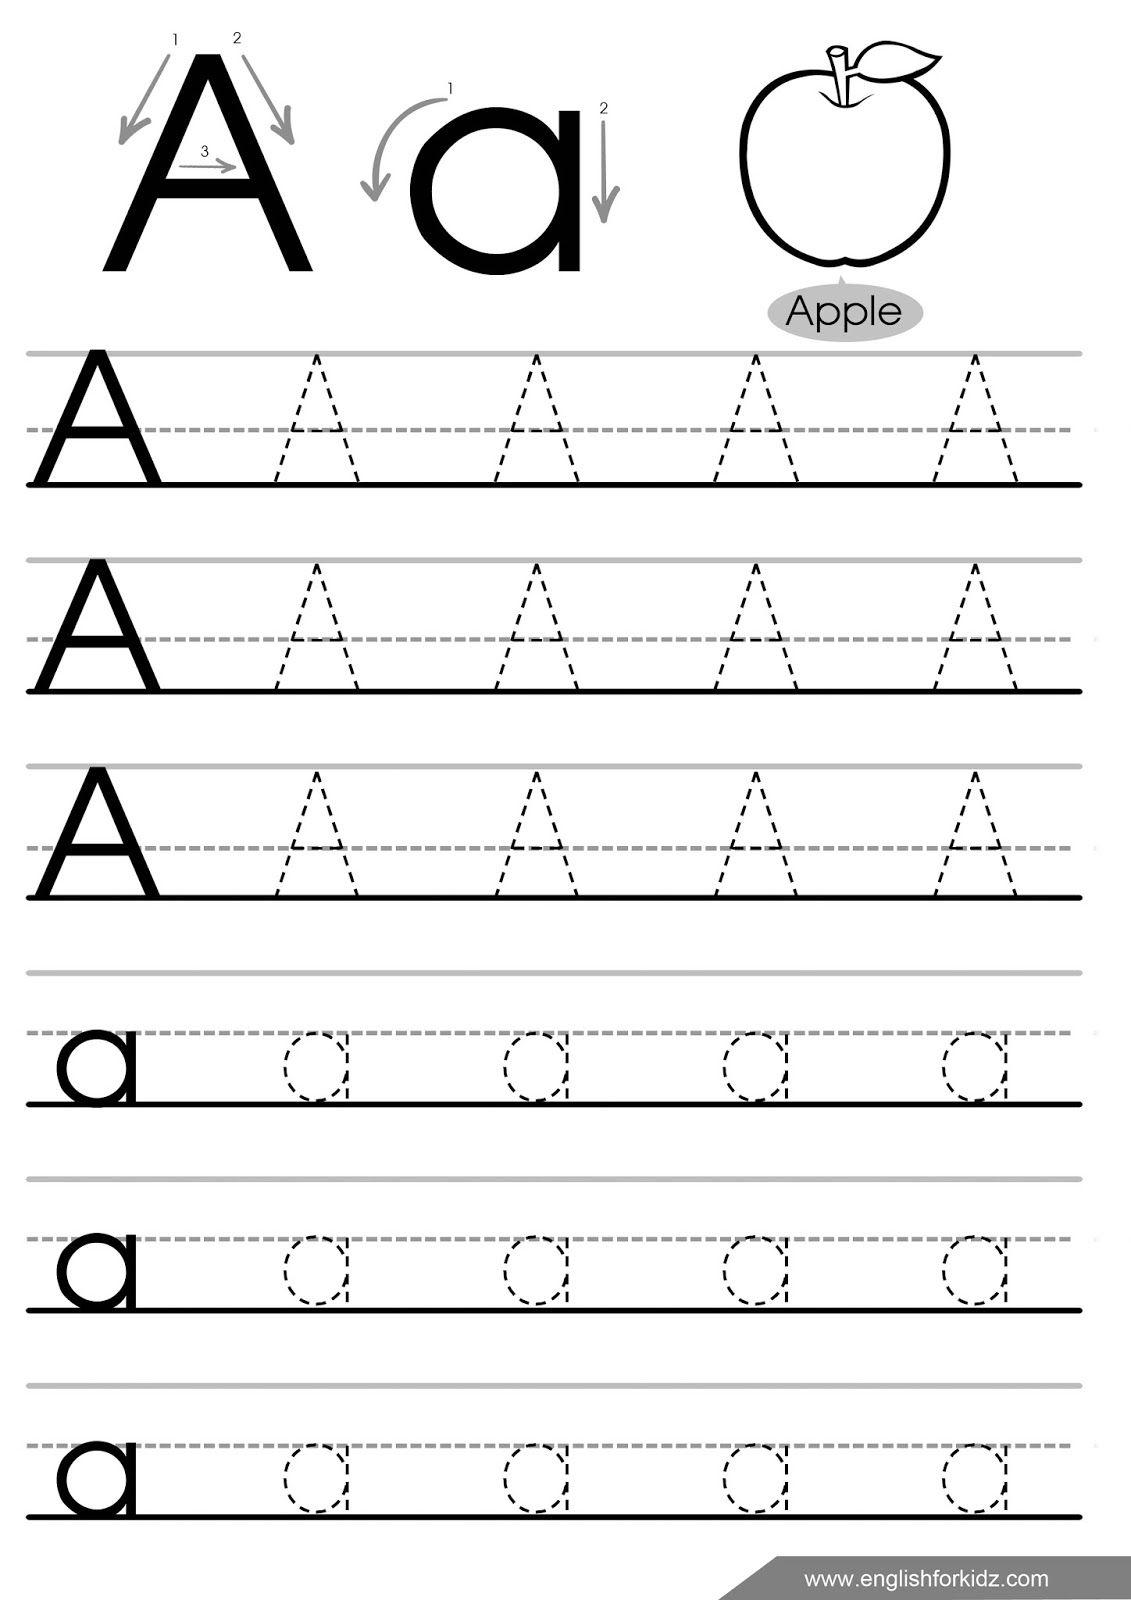 Letter Tracing Worksheet The Vowels | Printable Worksheets with Alphabet Tracing Worksheets For 4 Year Olds